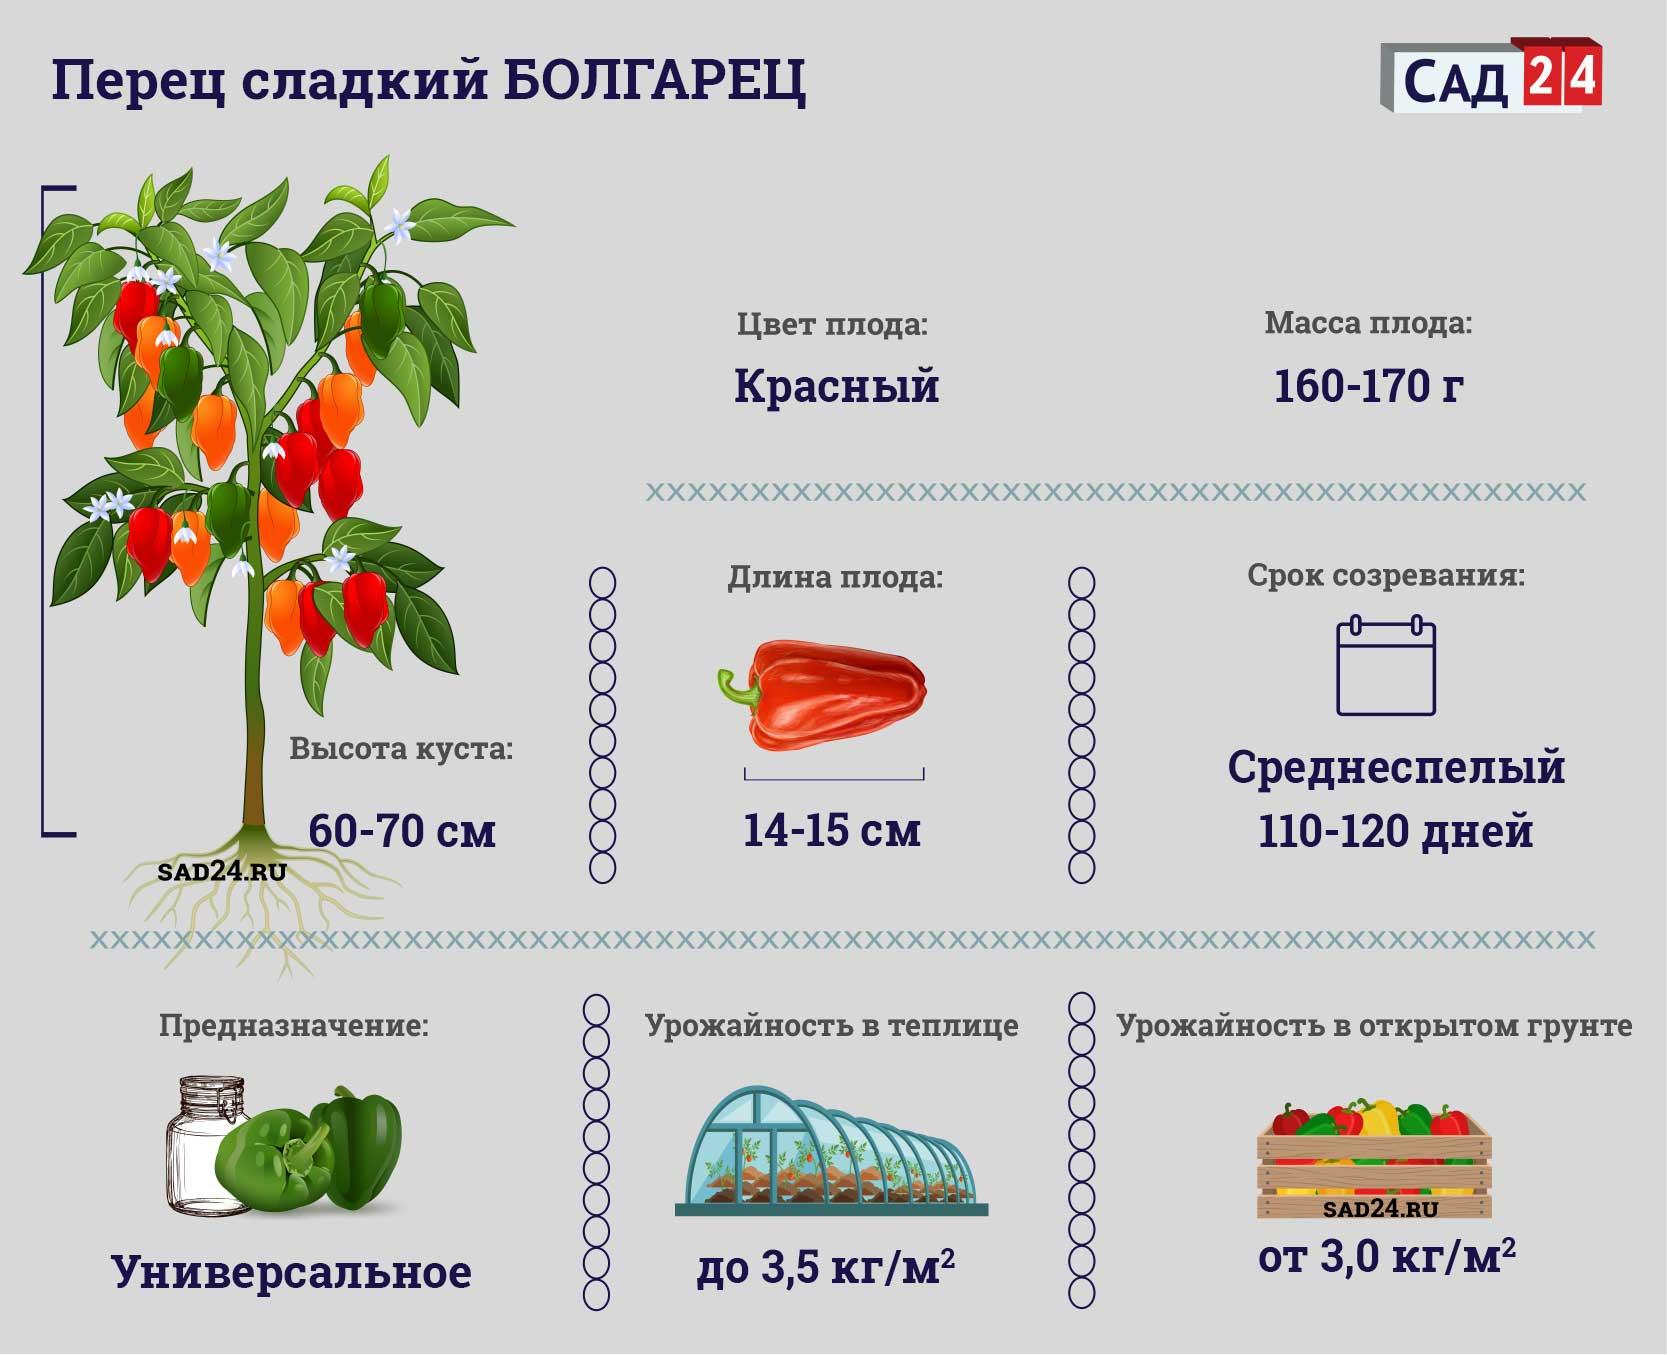 Болгарец - https://sad24.ru/